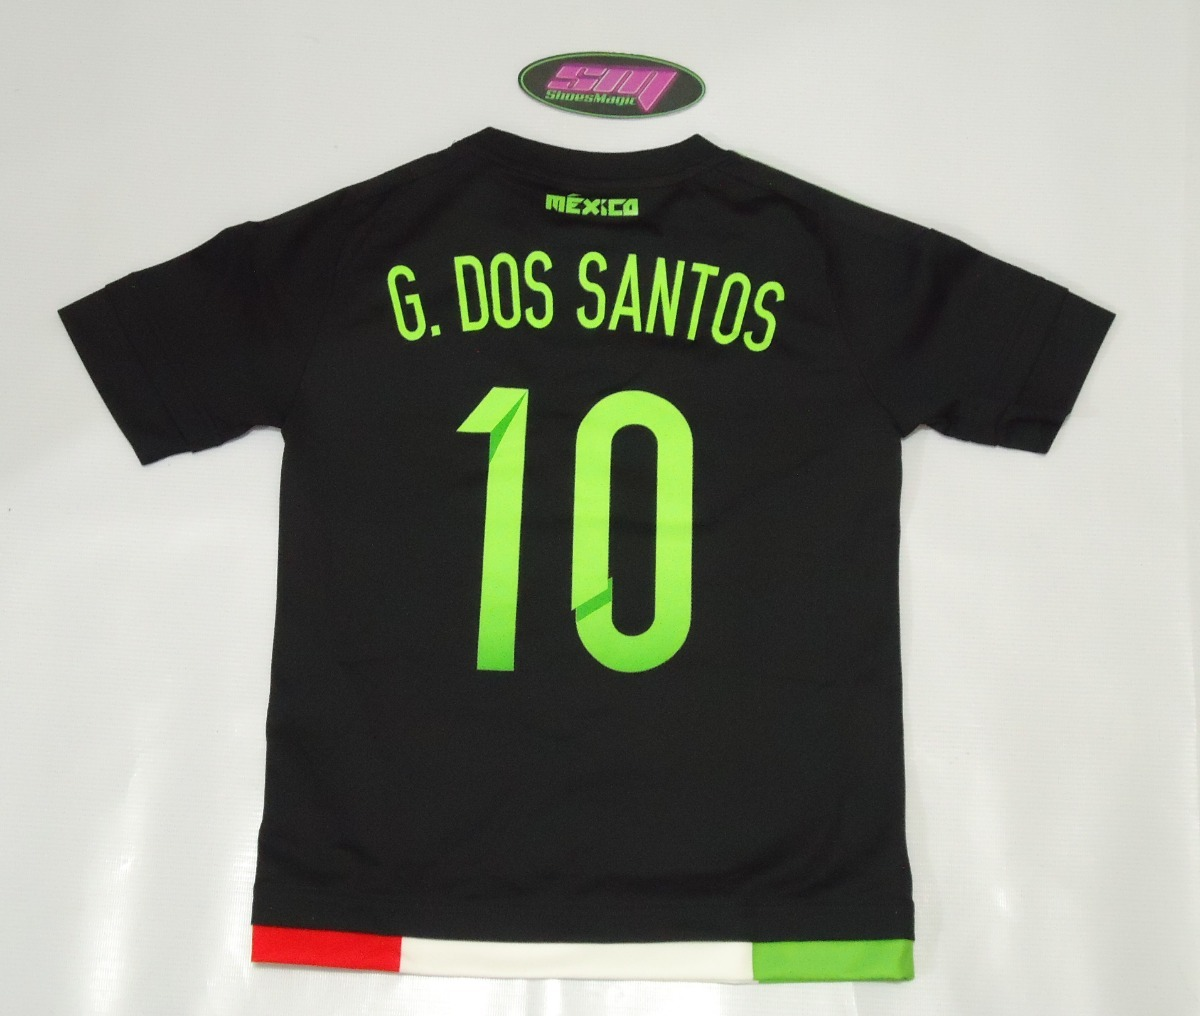 Playera adidas de mexico giovani dos santos para niño cargando zoom jpg  1200x1016 Playera giovani dos 029af30161aa8